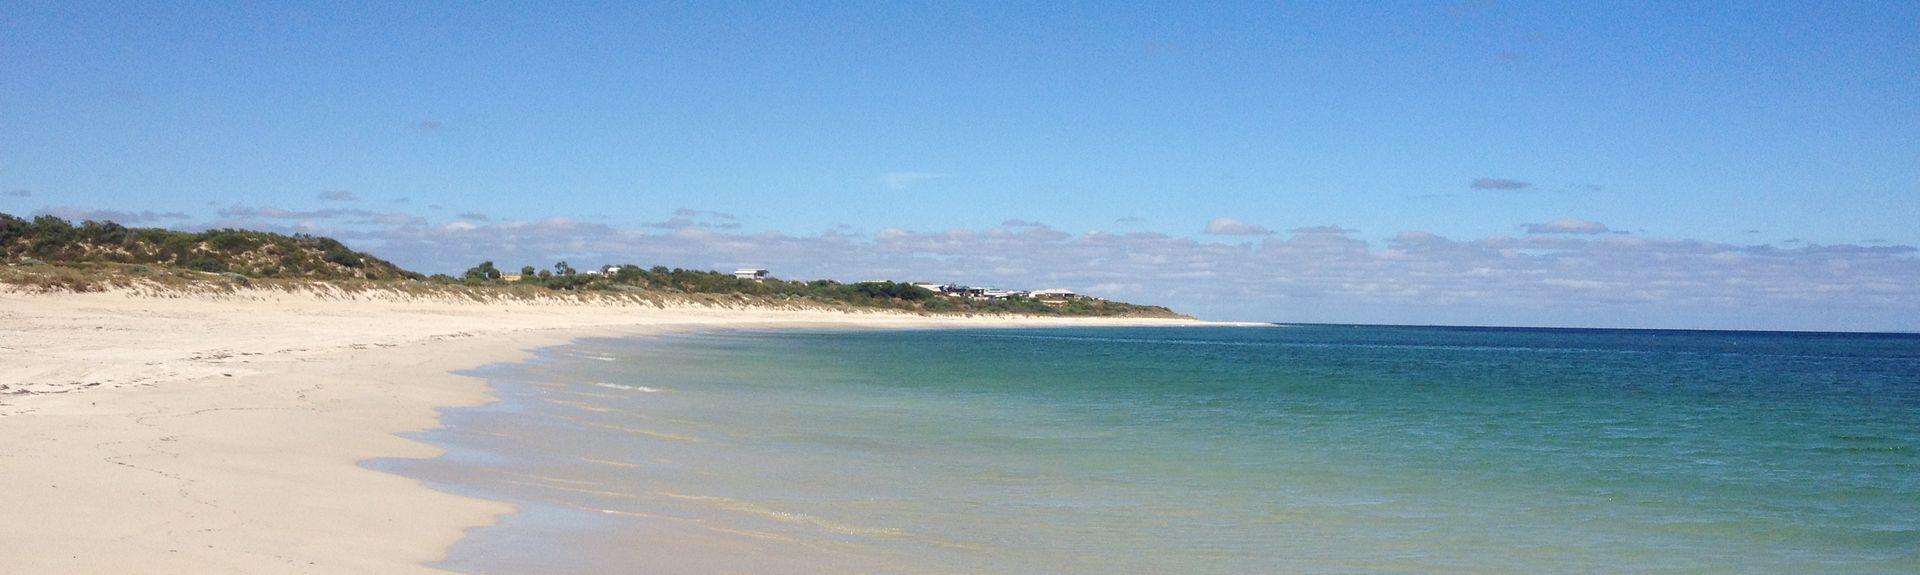 Donnybrook Country Club, Donnybrook, Western Australia, Australia